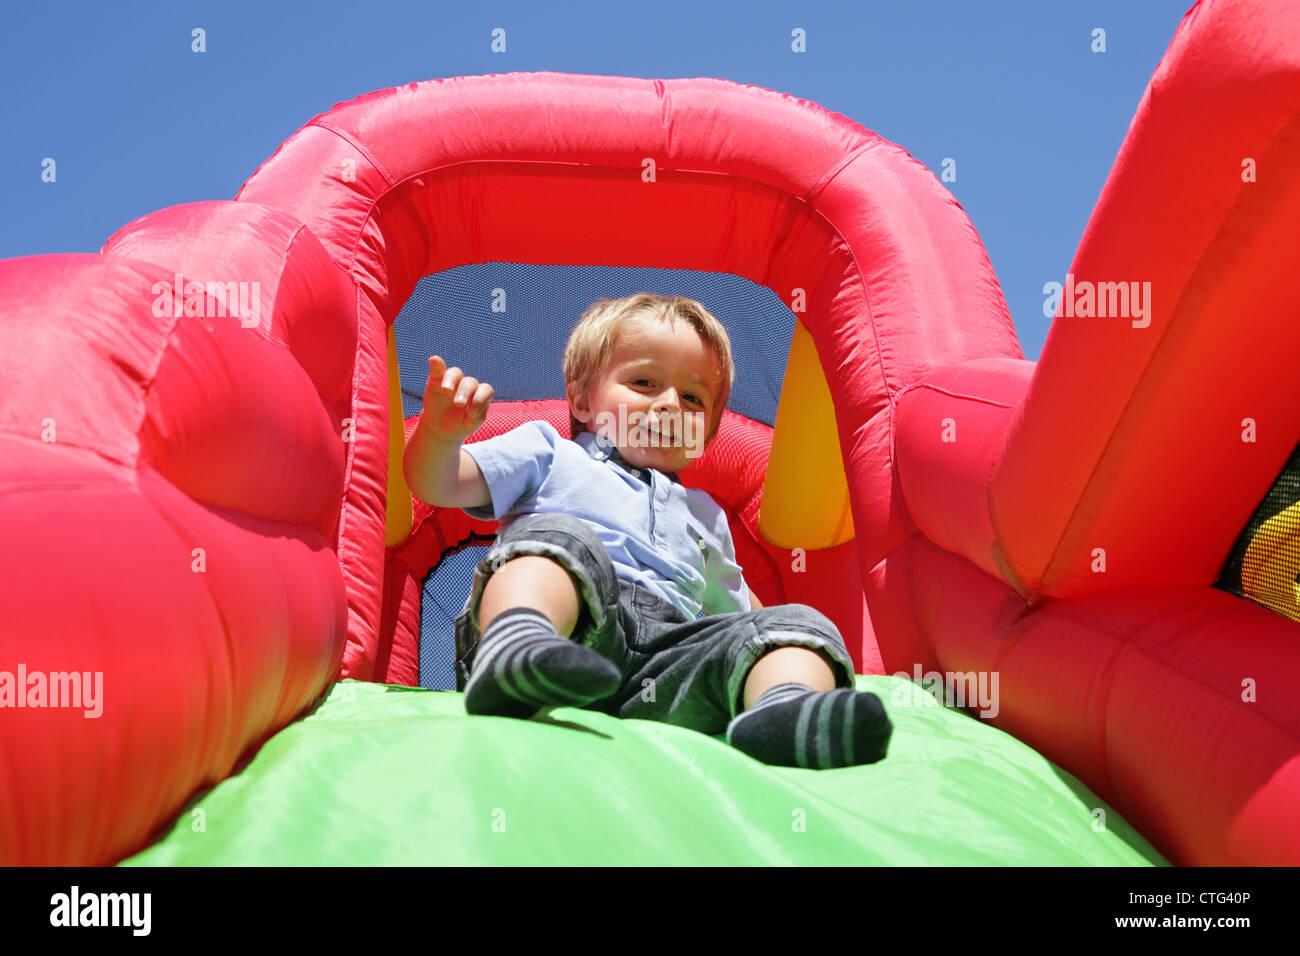 Bambino su gommoni bouncy castello slittaFoto Stock